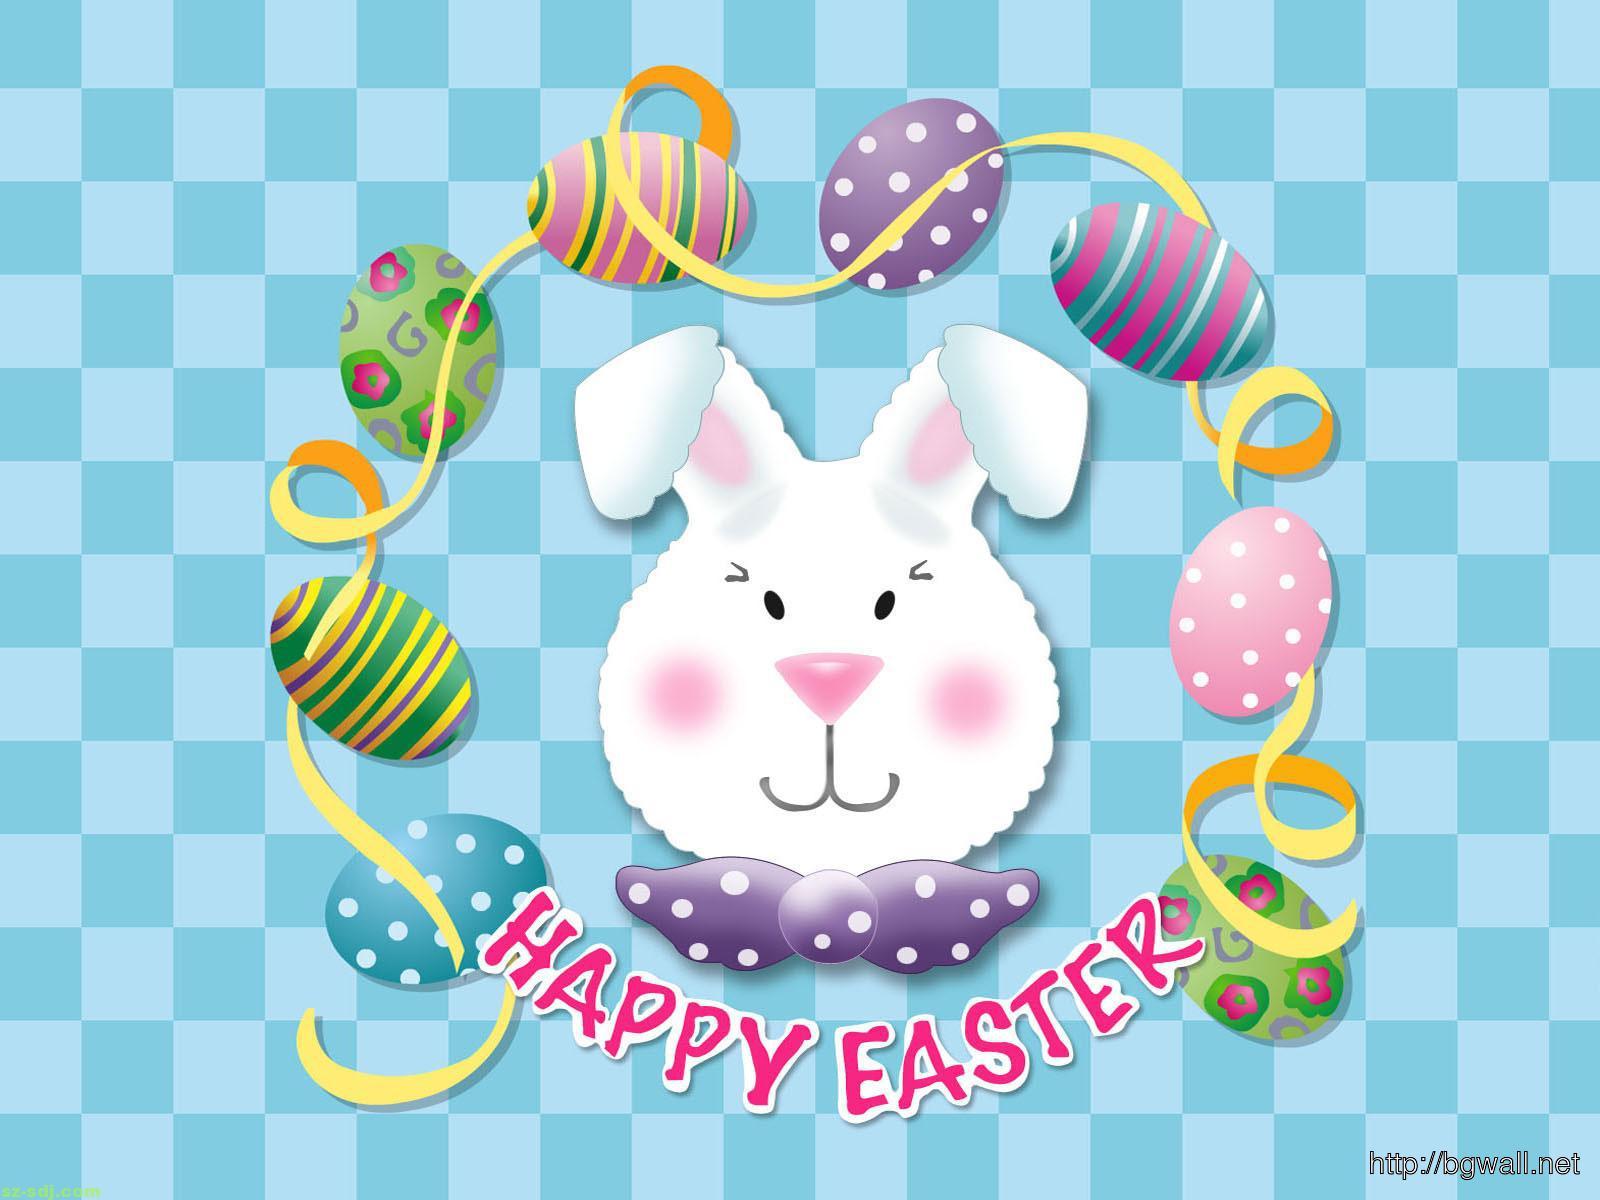 happy-easter-egg-bunny-wallpaper-pc